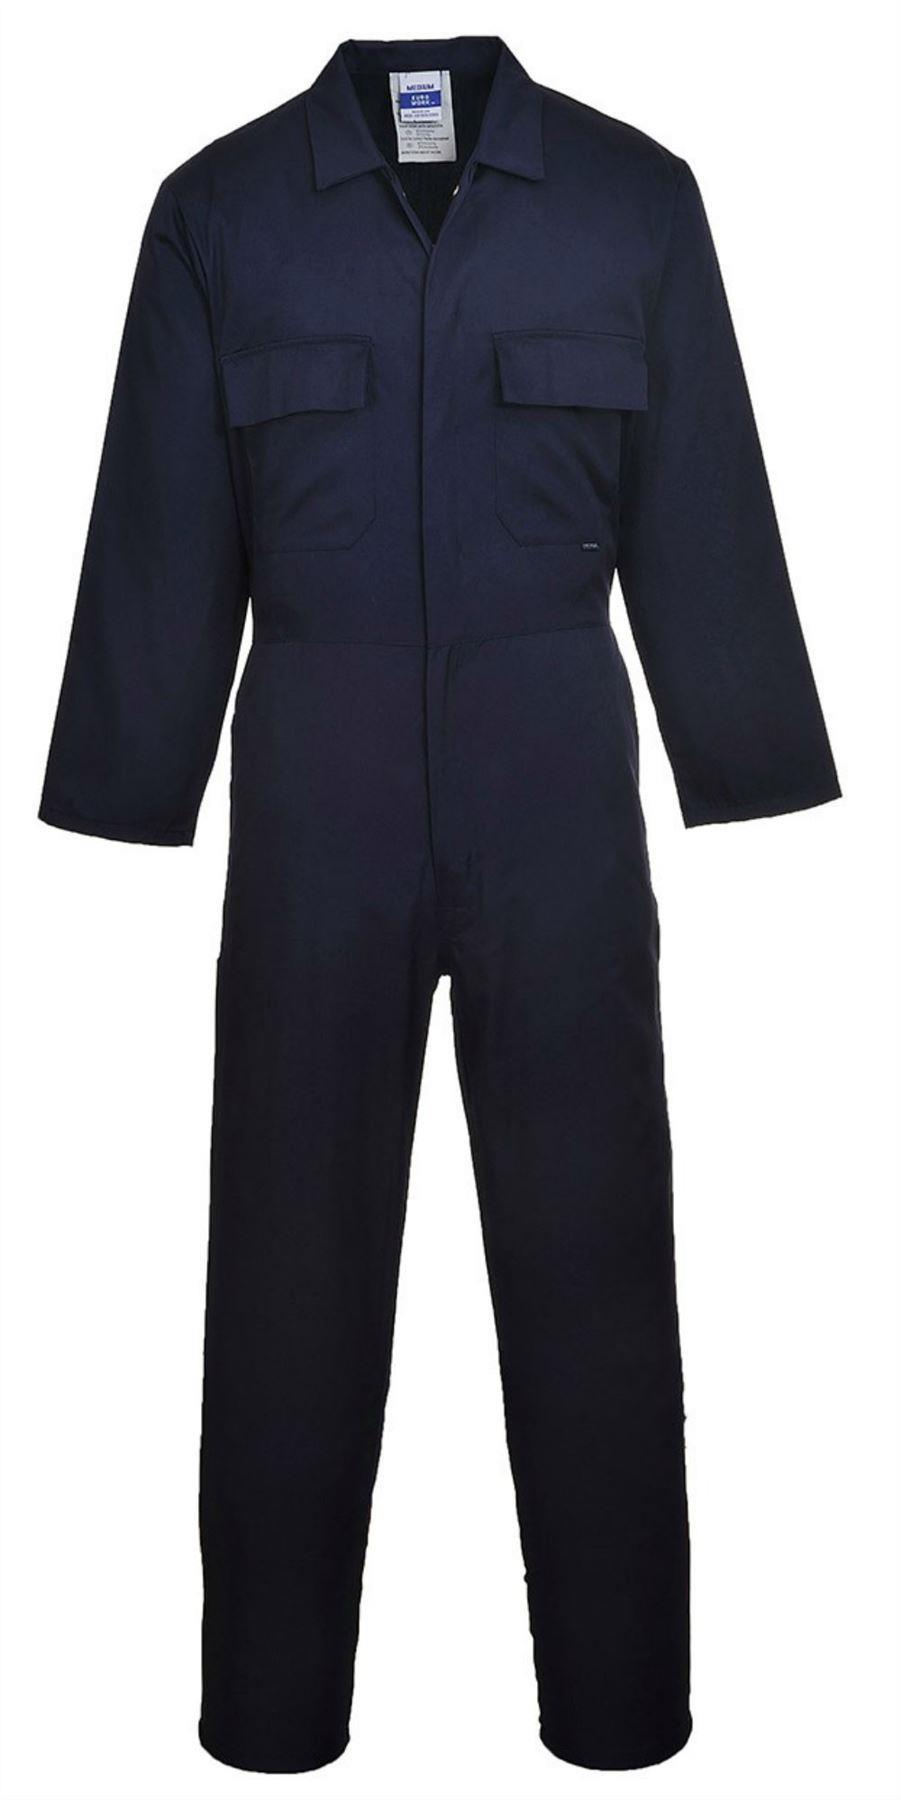 Portwest Standard Workwear Overalls - Navy